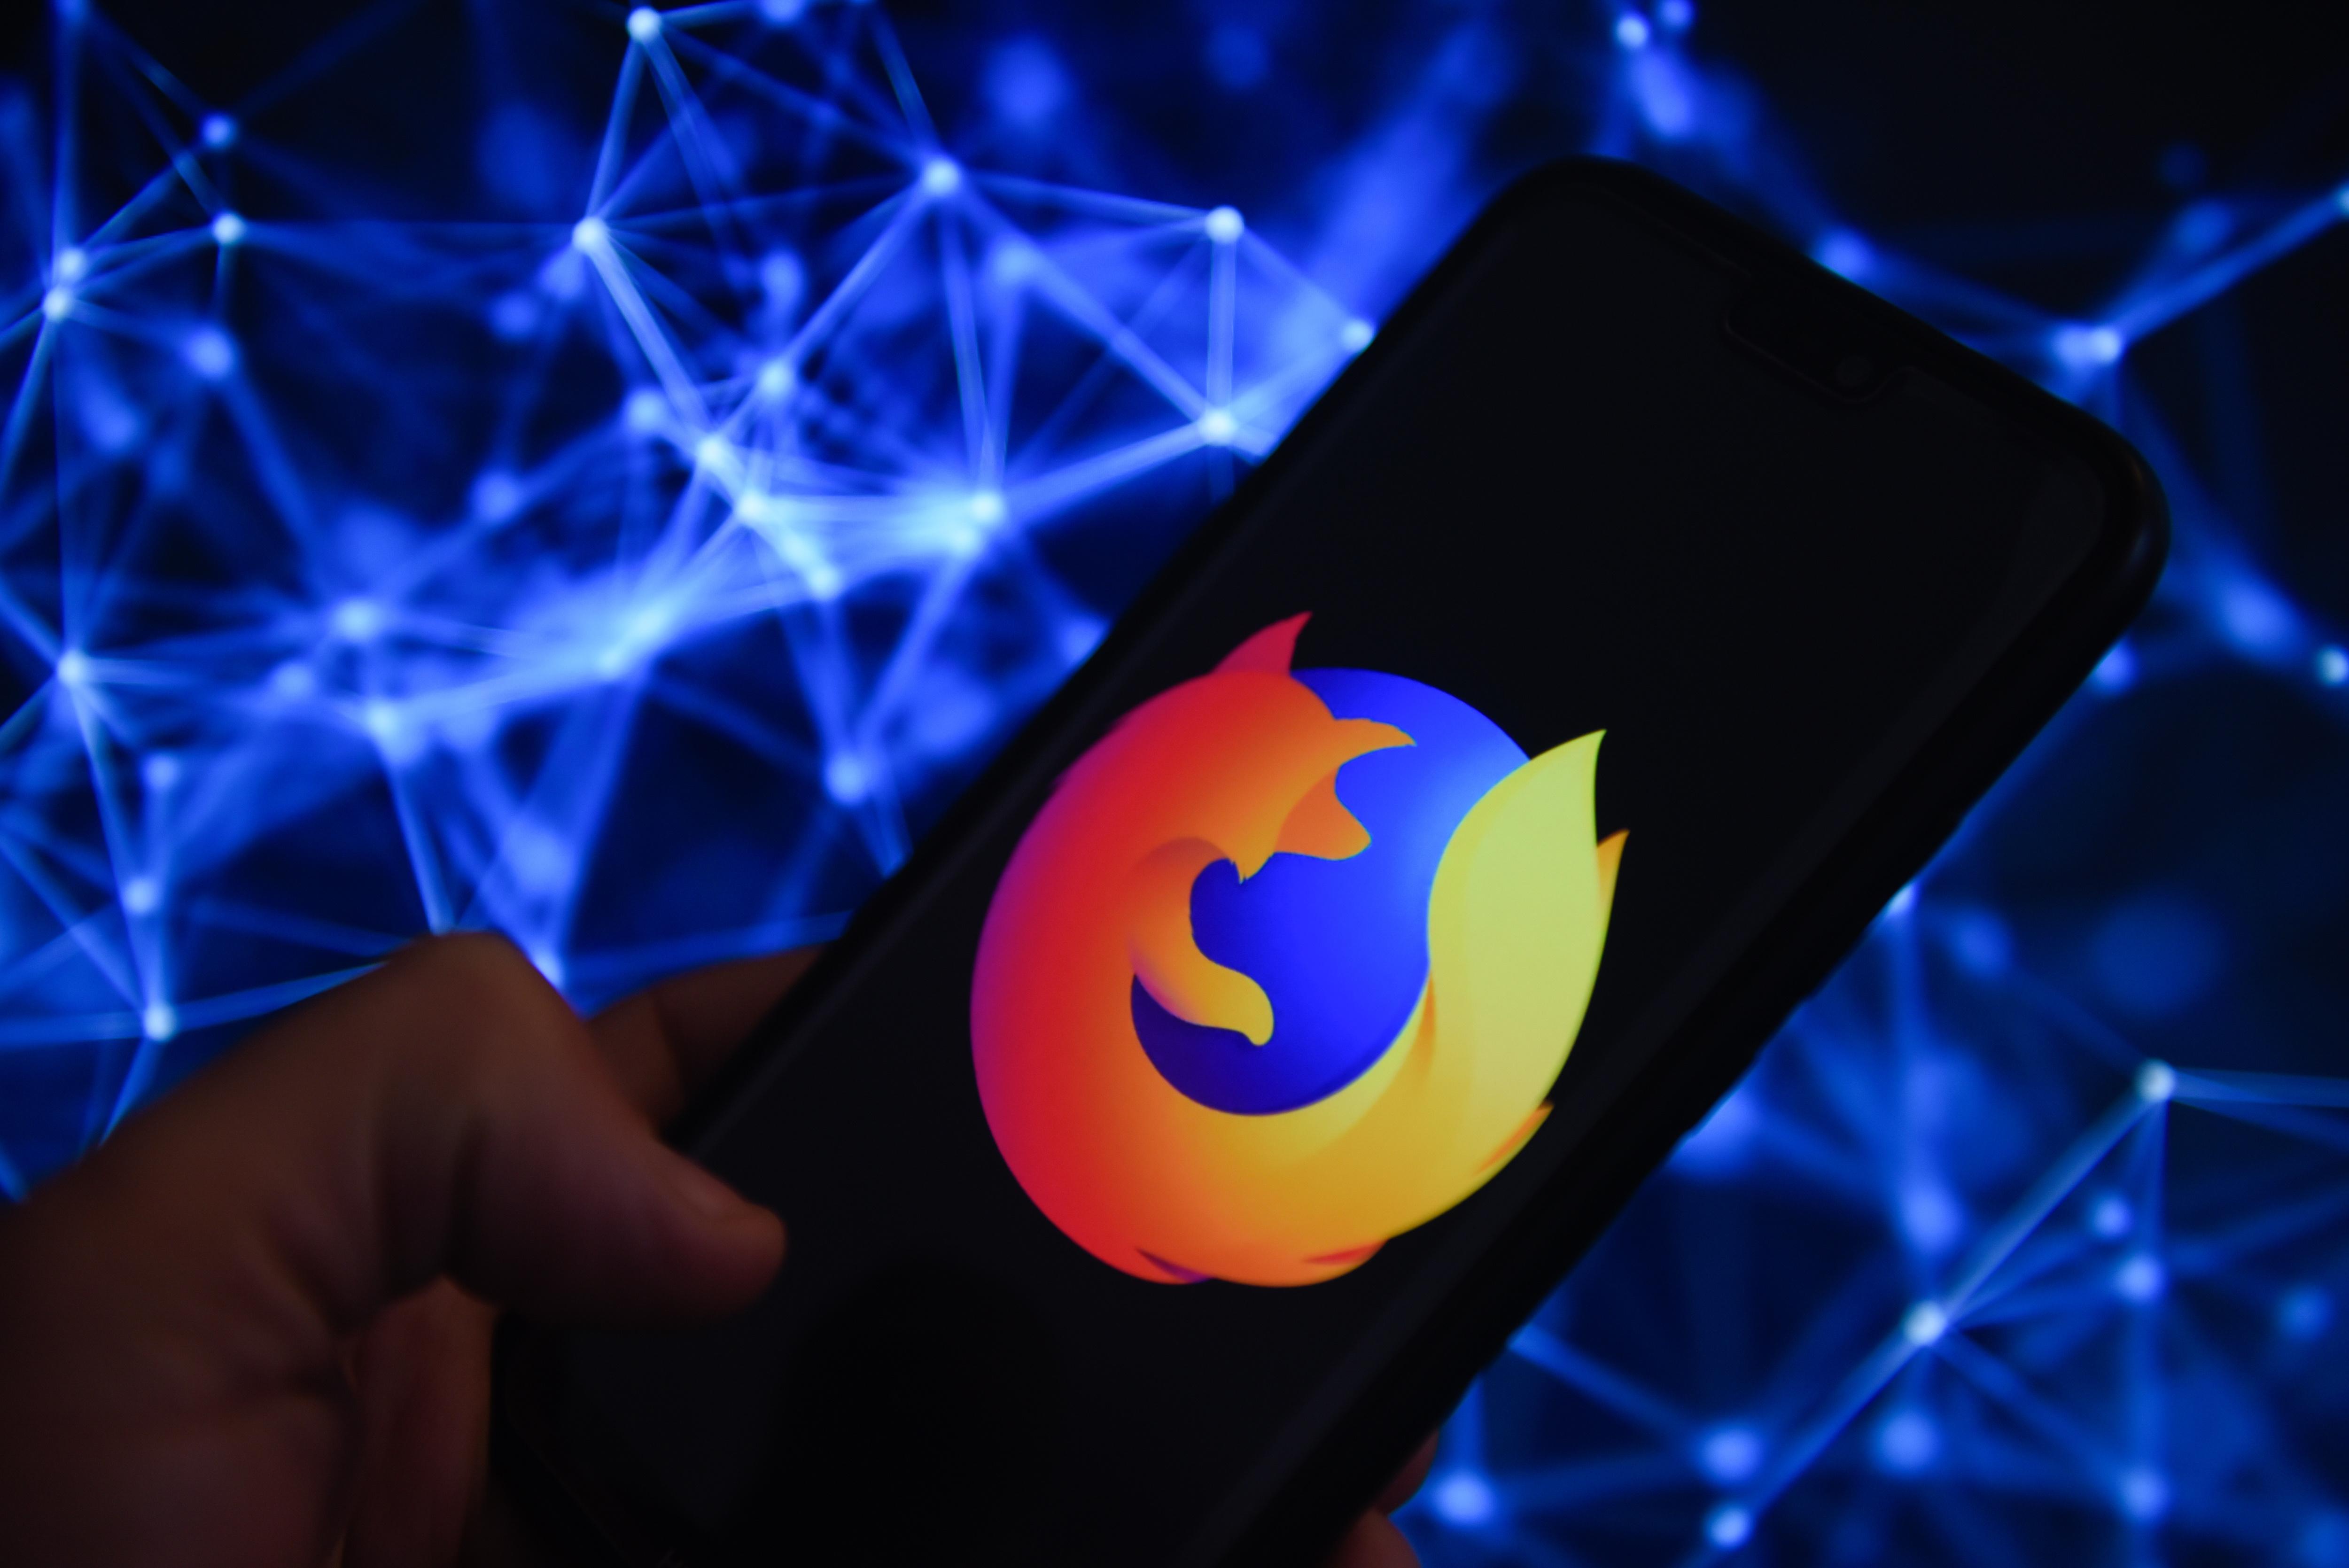 venturebeat.com - Khari Johnson - Mozilla highlights AI bias and 'addiction by design' tech in internet health report